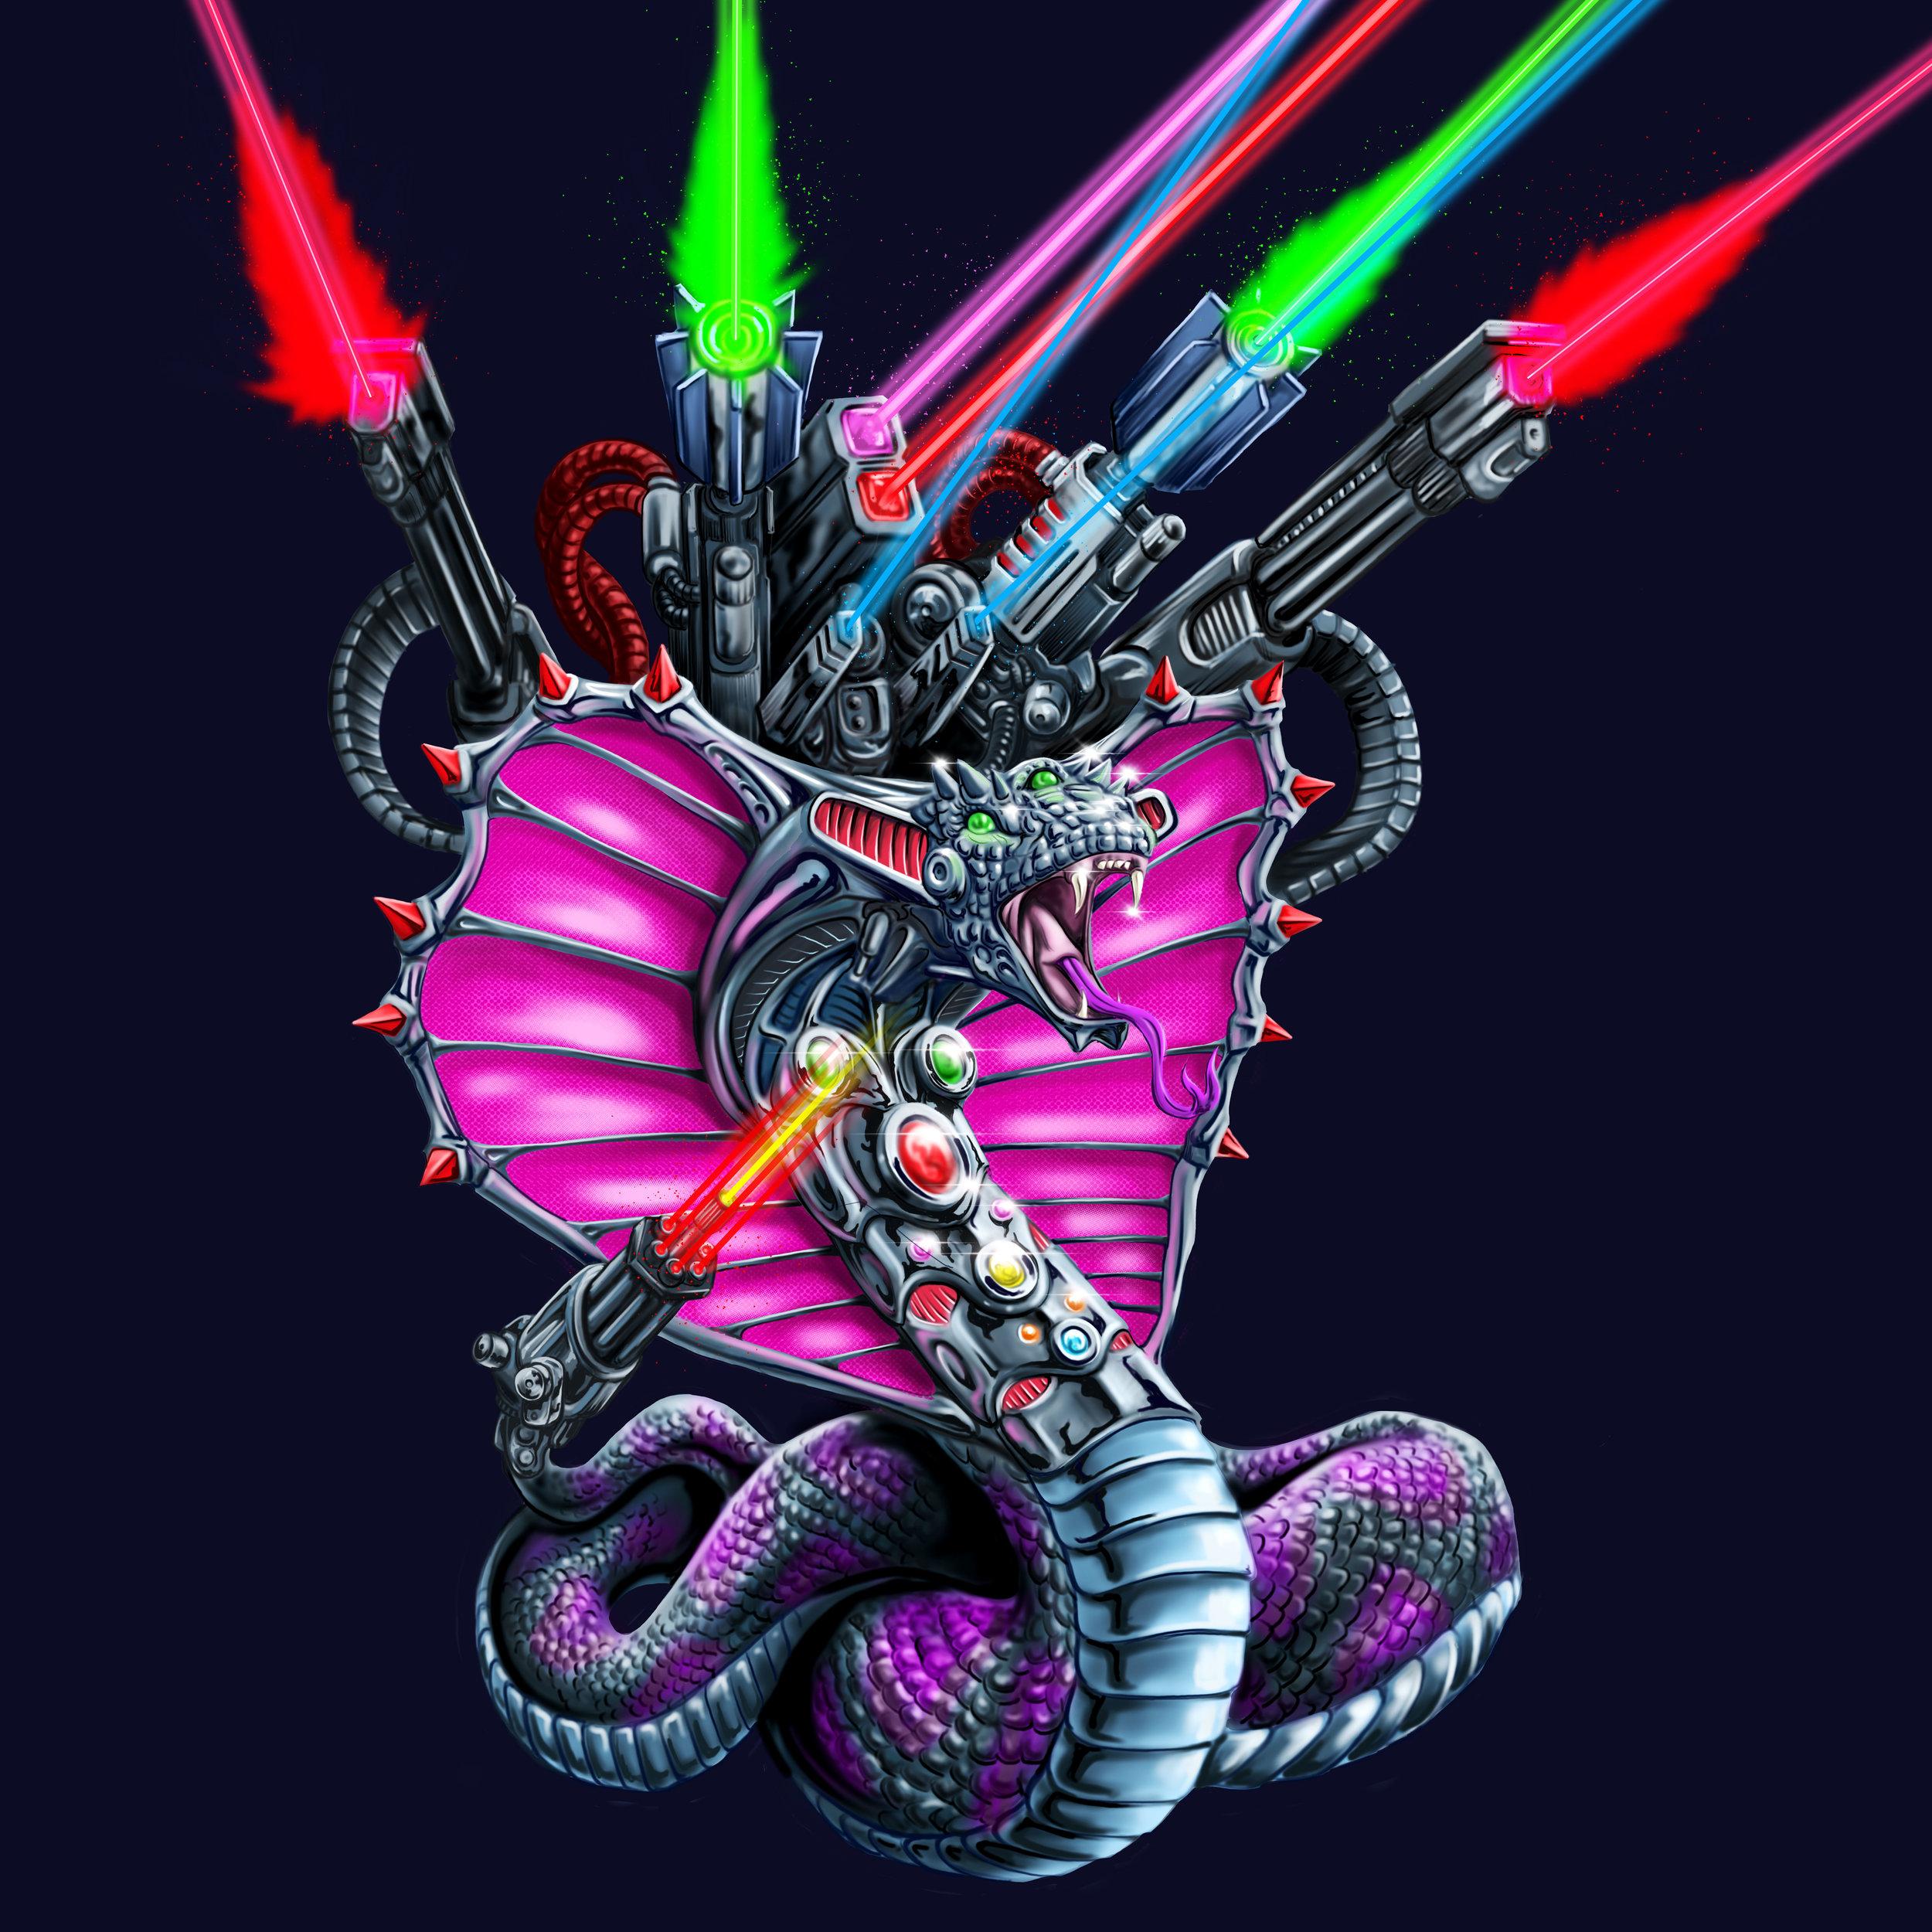 Lazer Snake Illustration